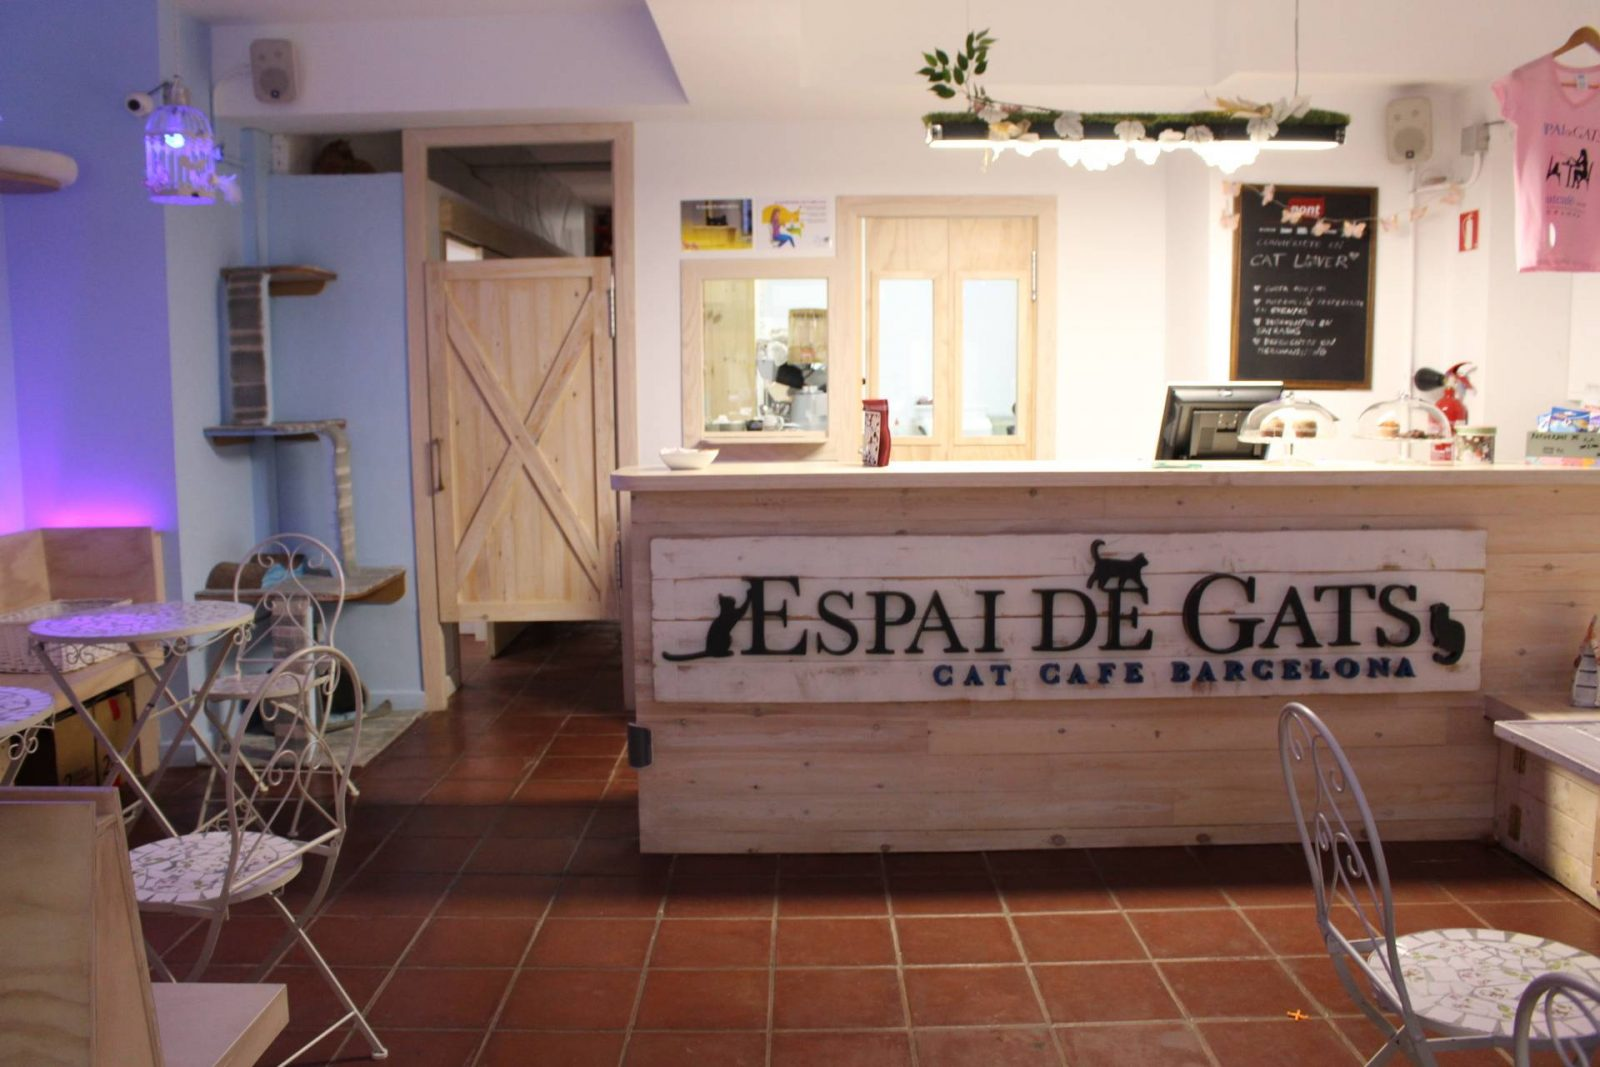 Espai de Gats Barcelona cat cafe